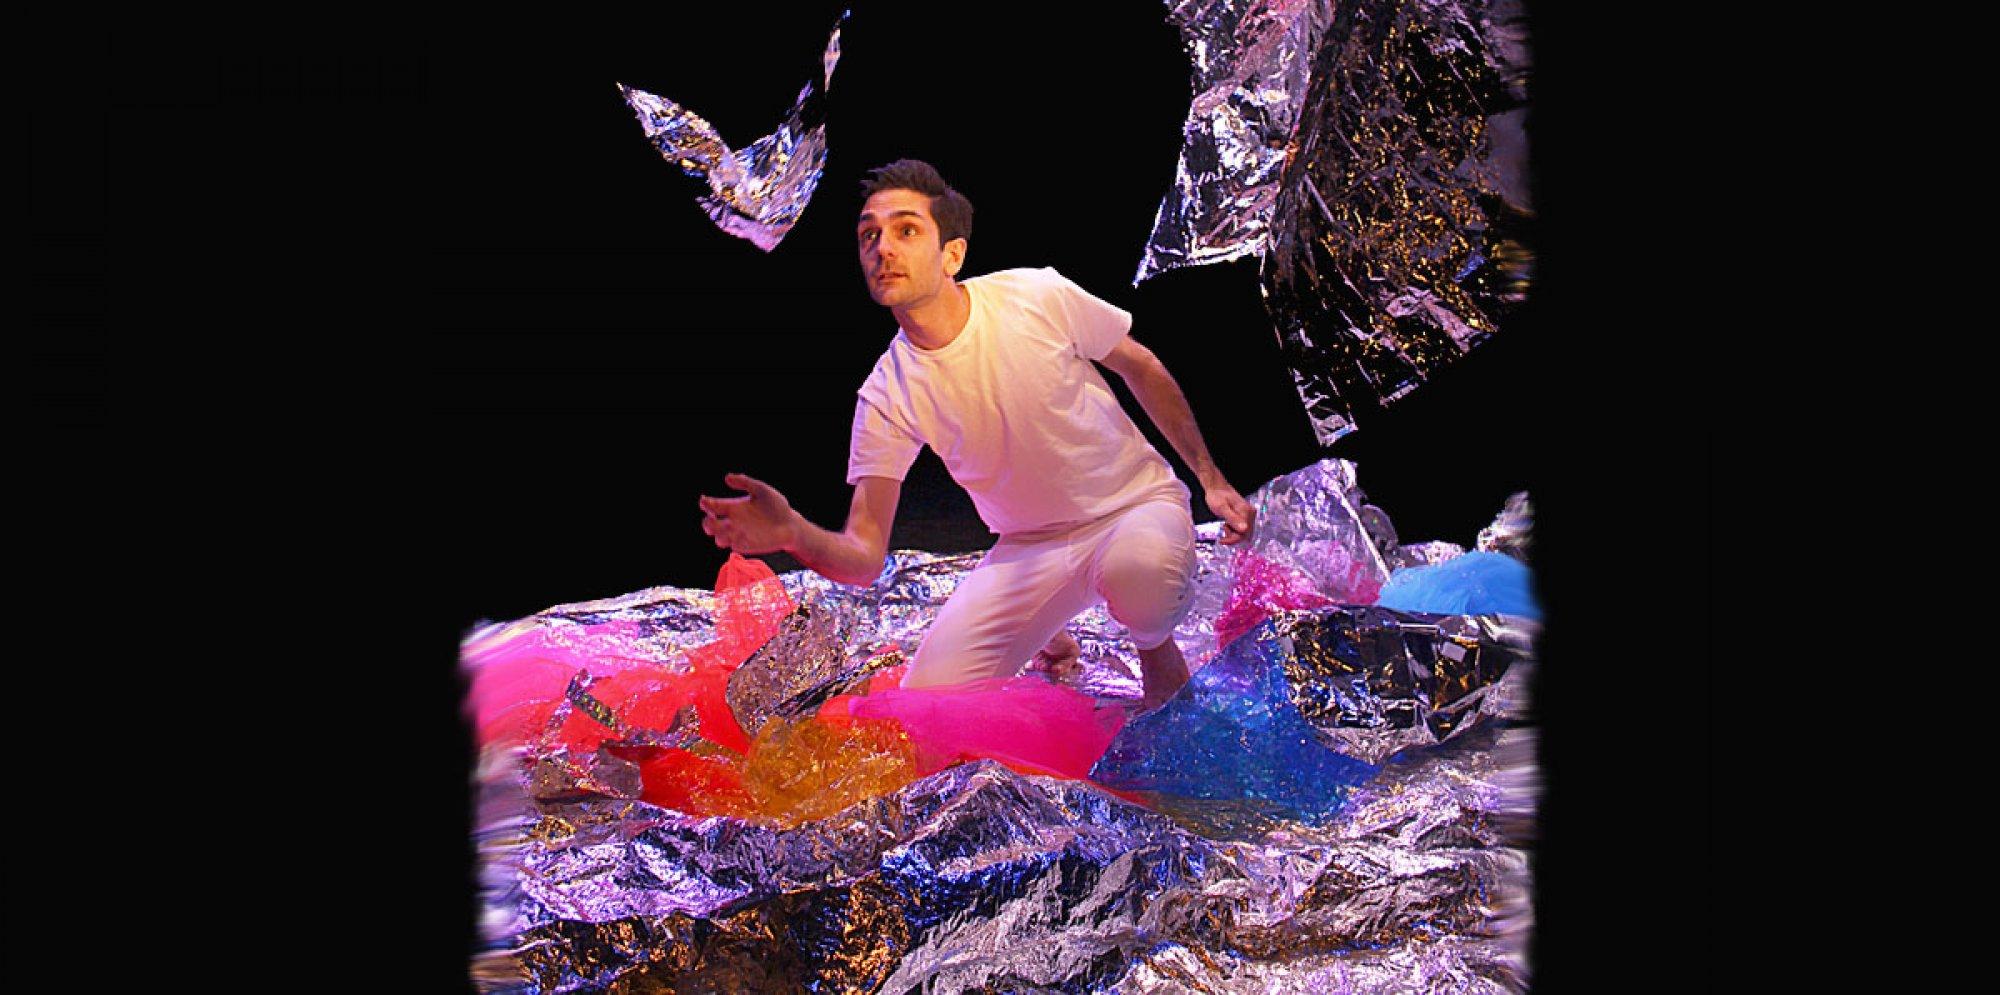 Glisten - The performer kneels amongst glistening foil. A piece of foil flies bird like through the air